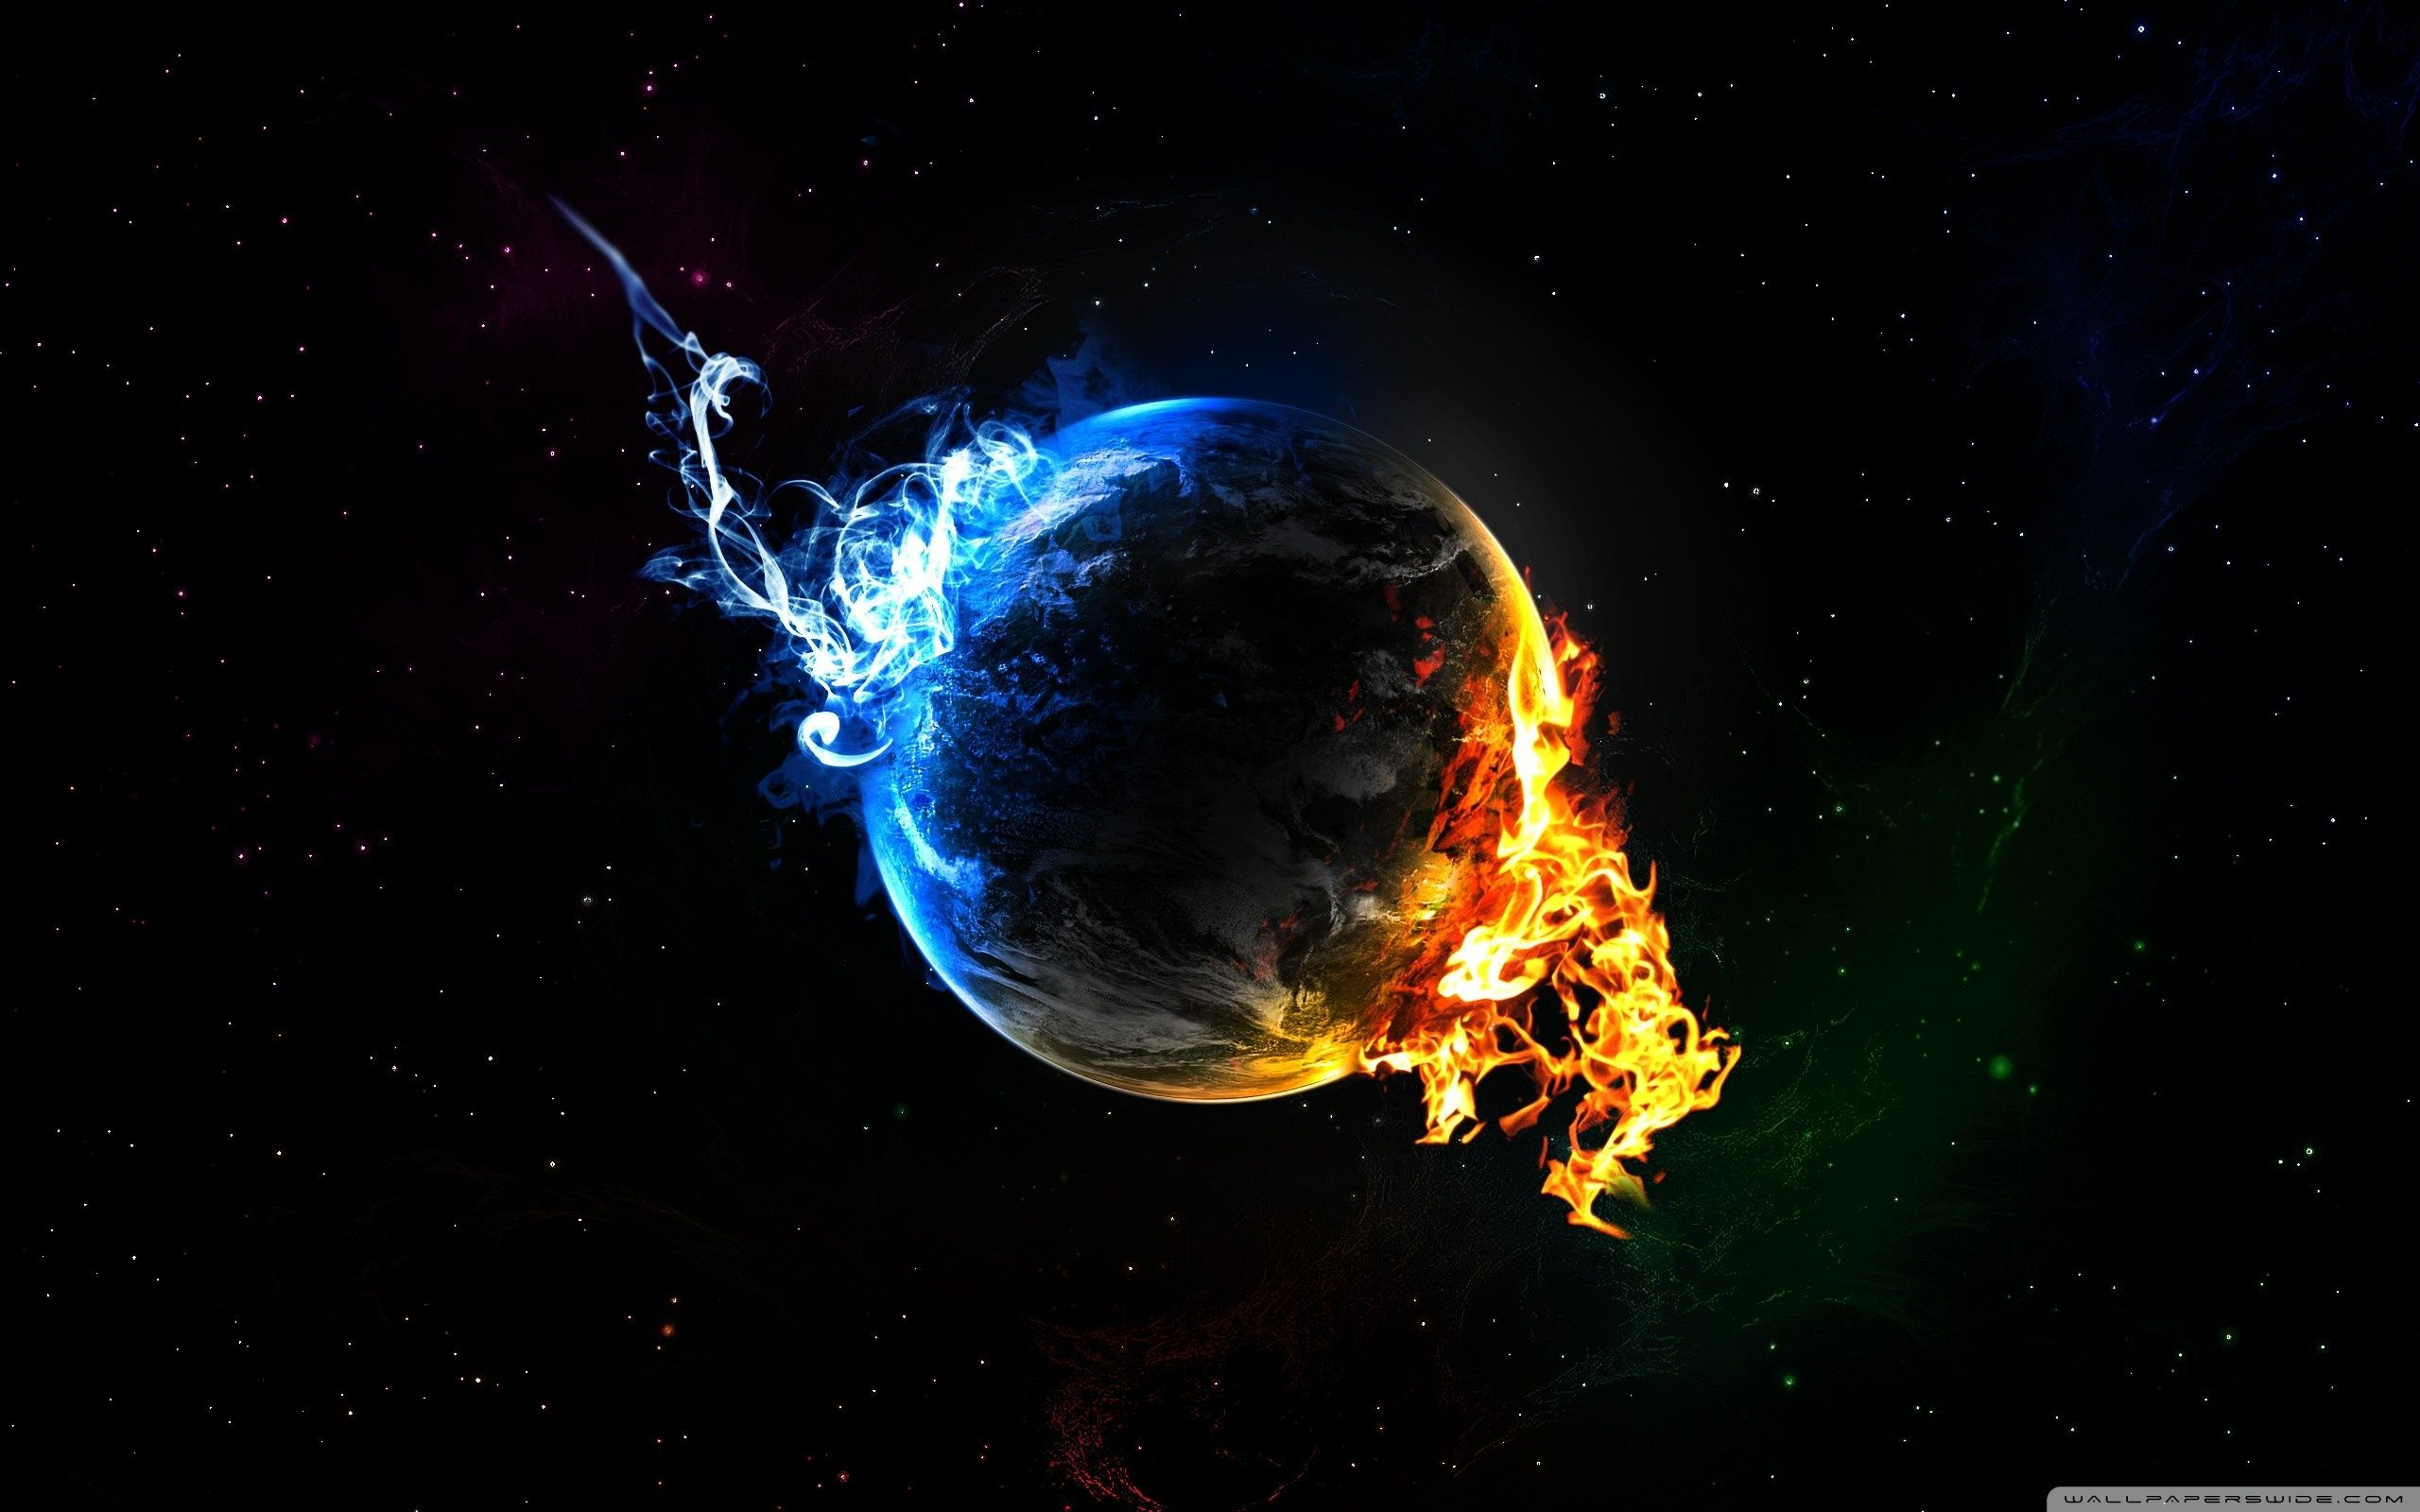 Fire and ice fractal abstract wallpaper hd wallpapers - Fire Fist Vs Water Fist Hd Desktop Wallpaper High Definition